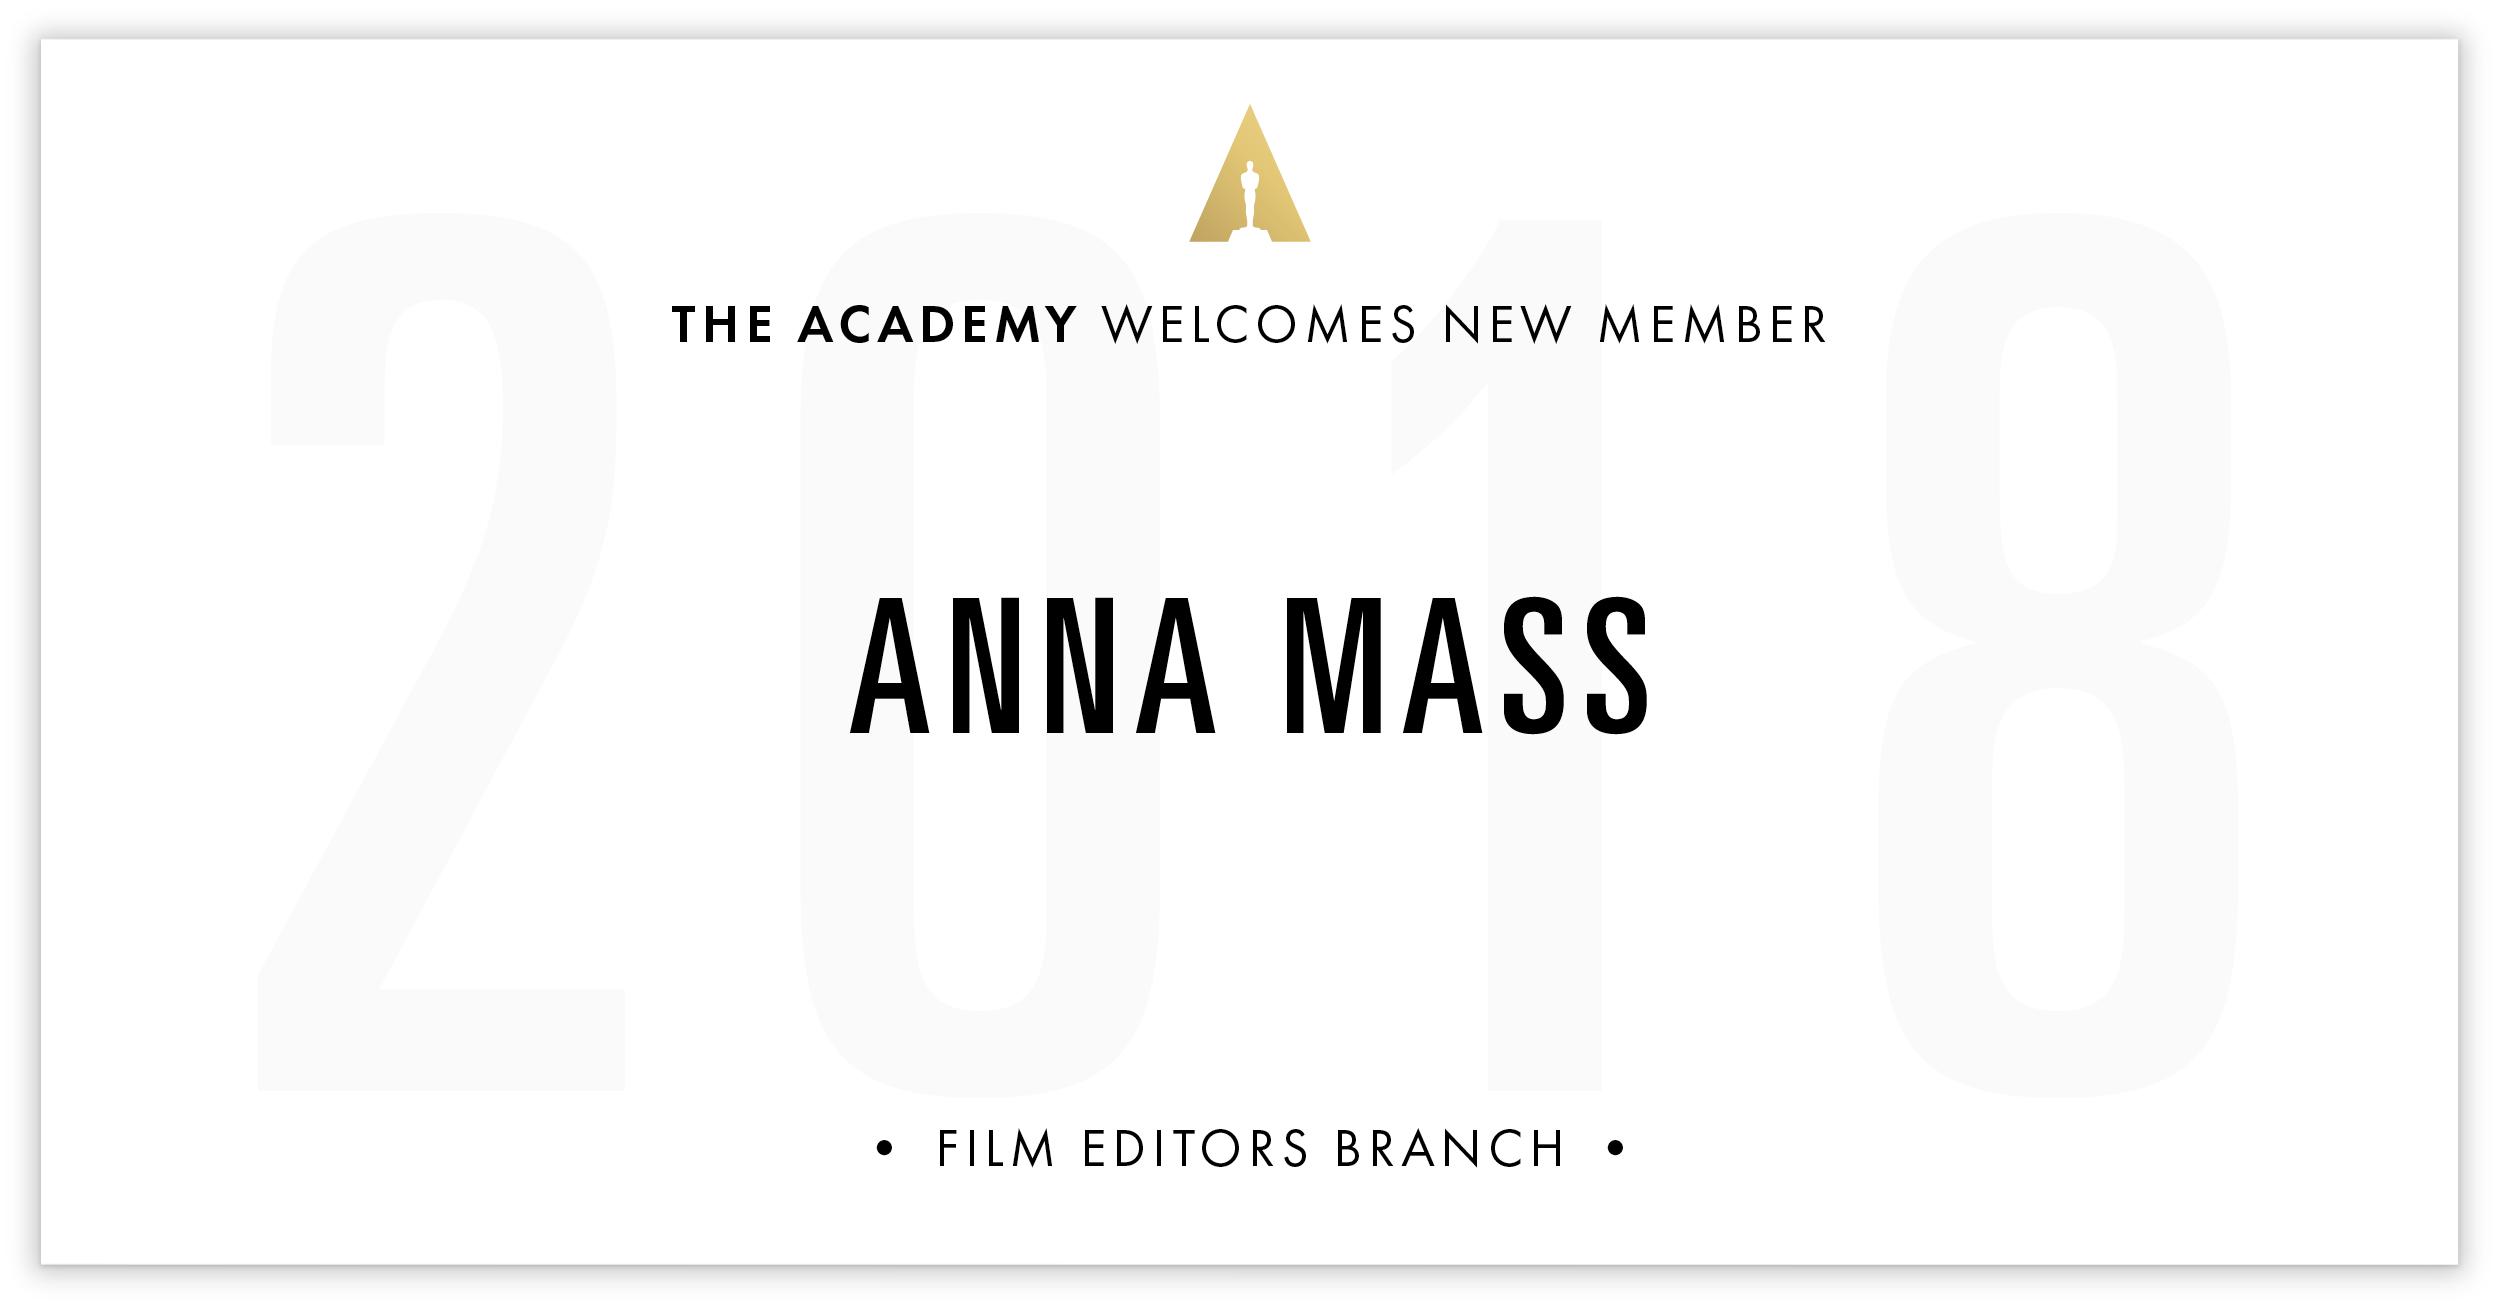 Anna Mass is invited!